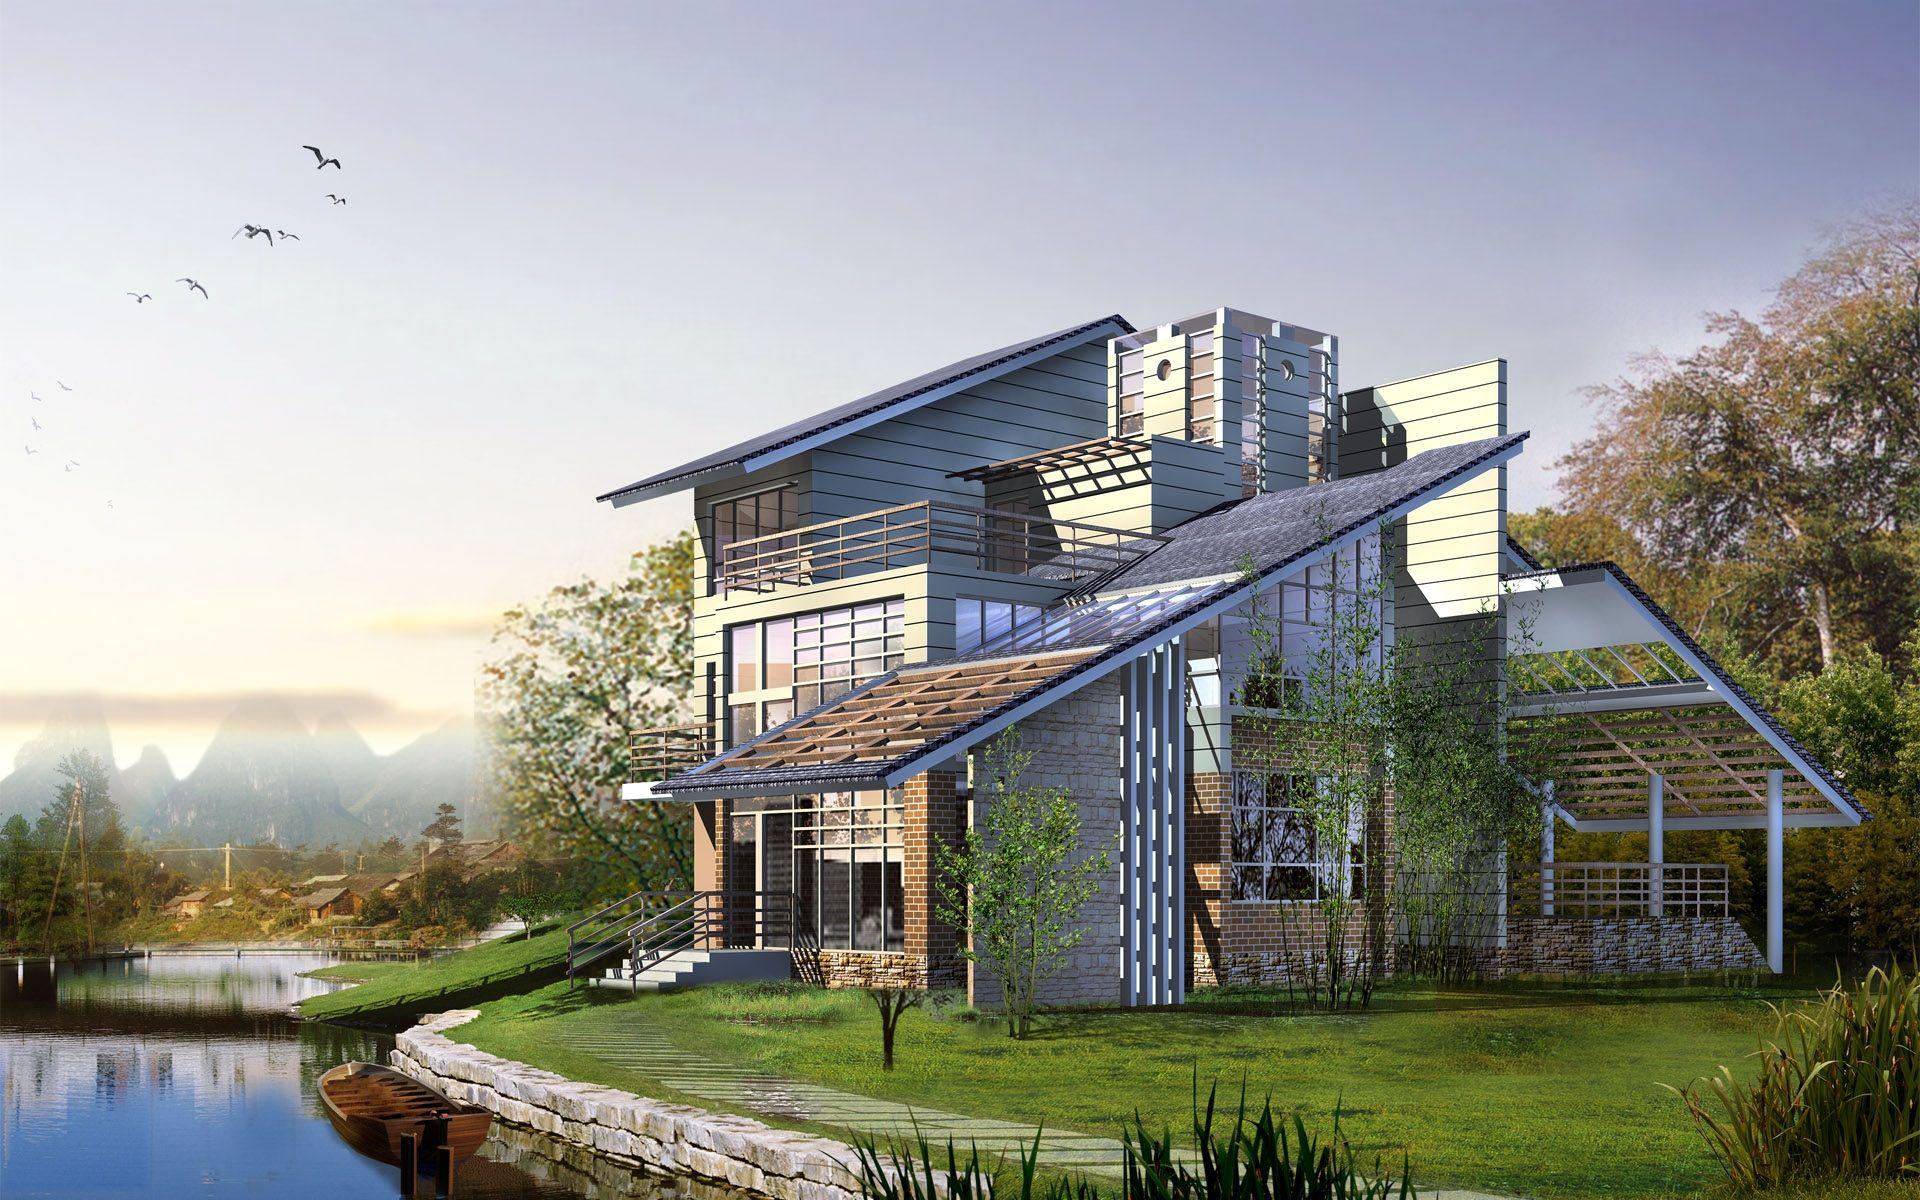 Futuristic houses design future design with futuristic houses cool home inspiration